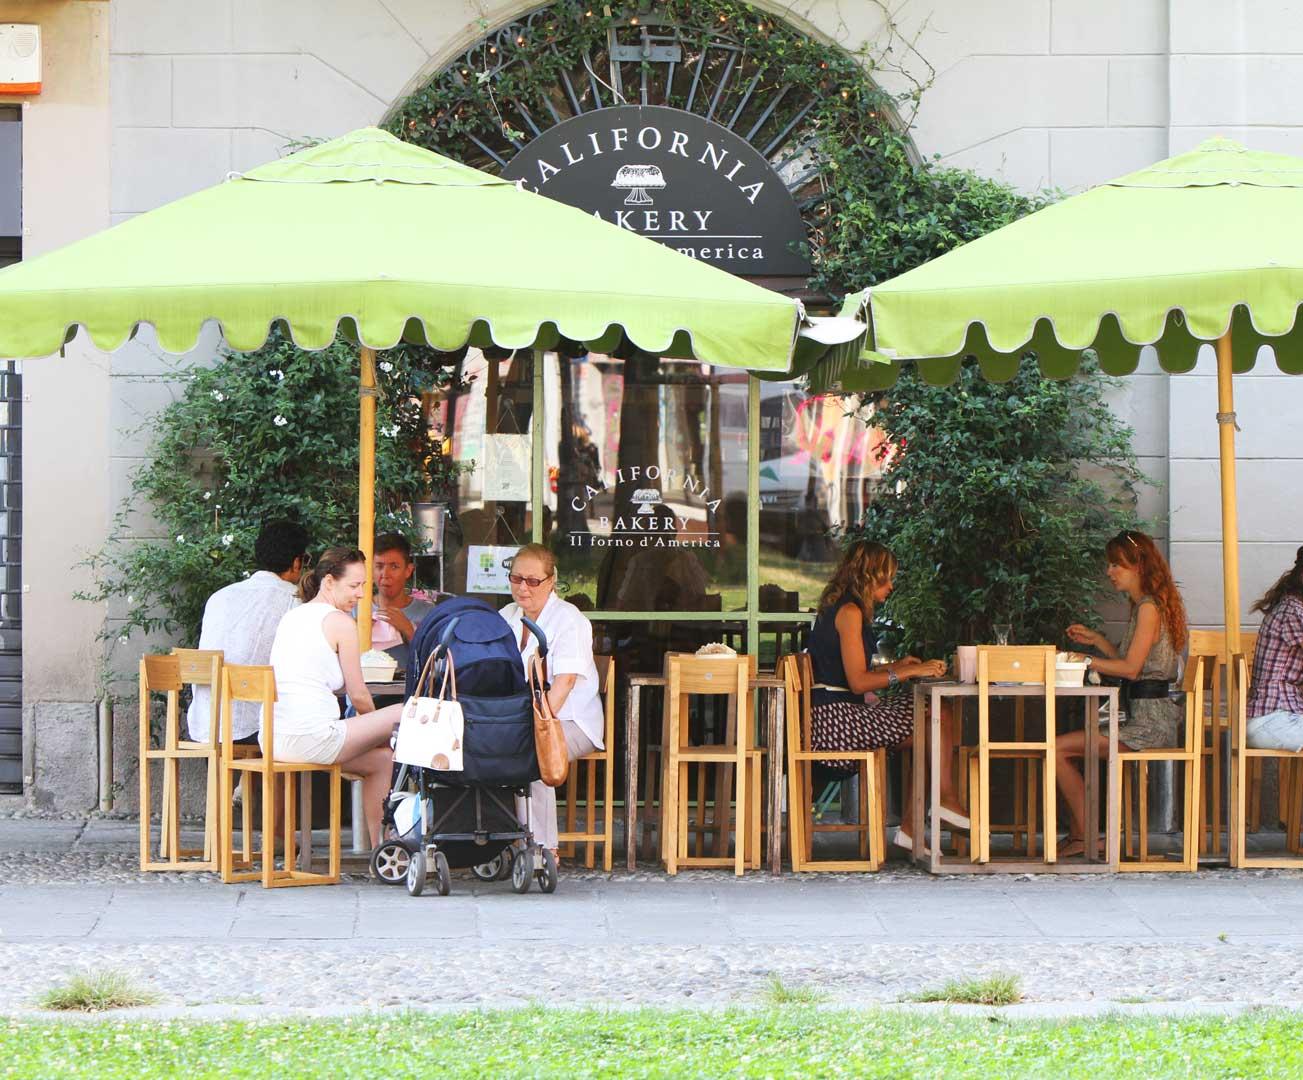 California bakery sant 39 eustorgio flawless milano for Piazza sant eustorgio